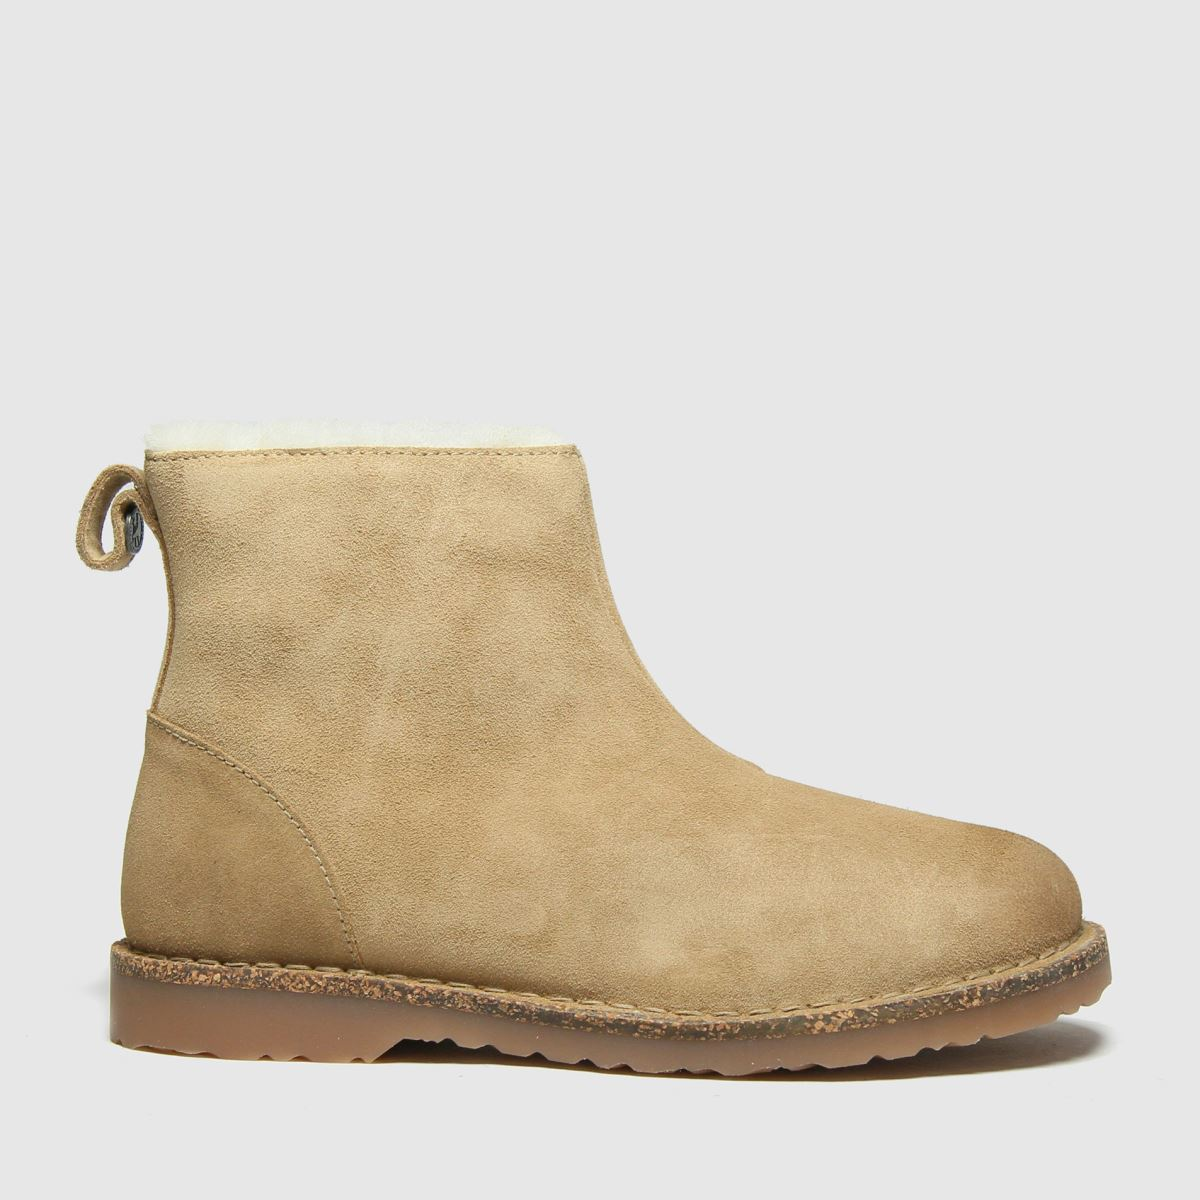 BIRKENSTOCK Beige Melrose Boots